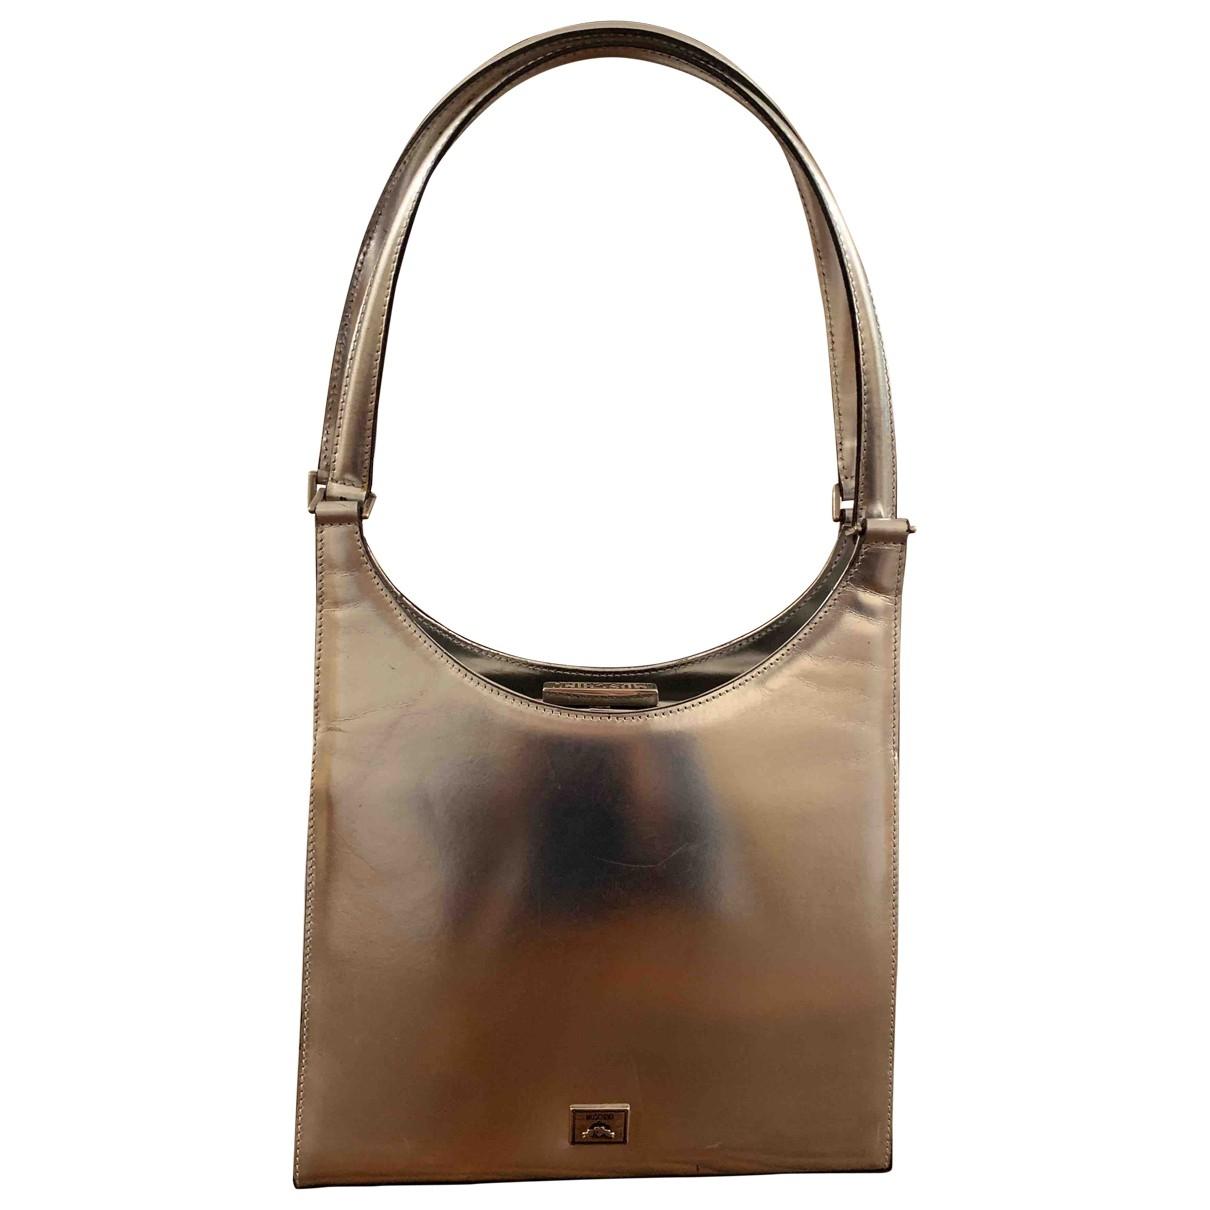 Moschino \N Silver Leather handbag for Women \N